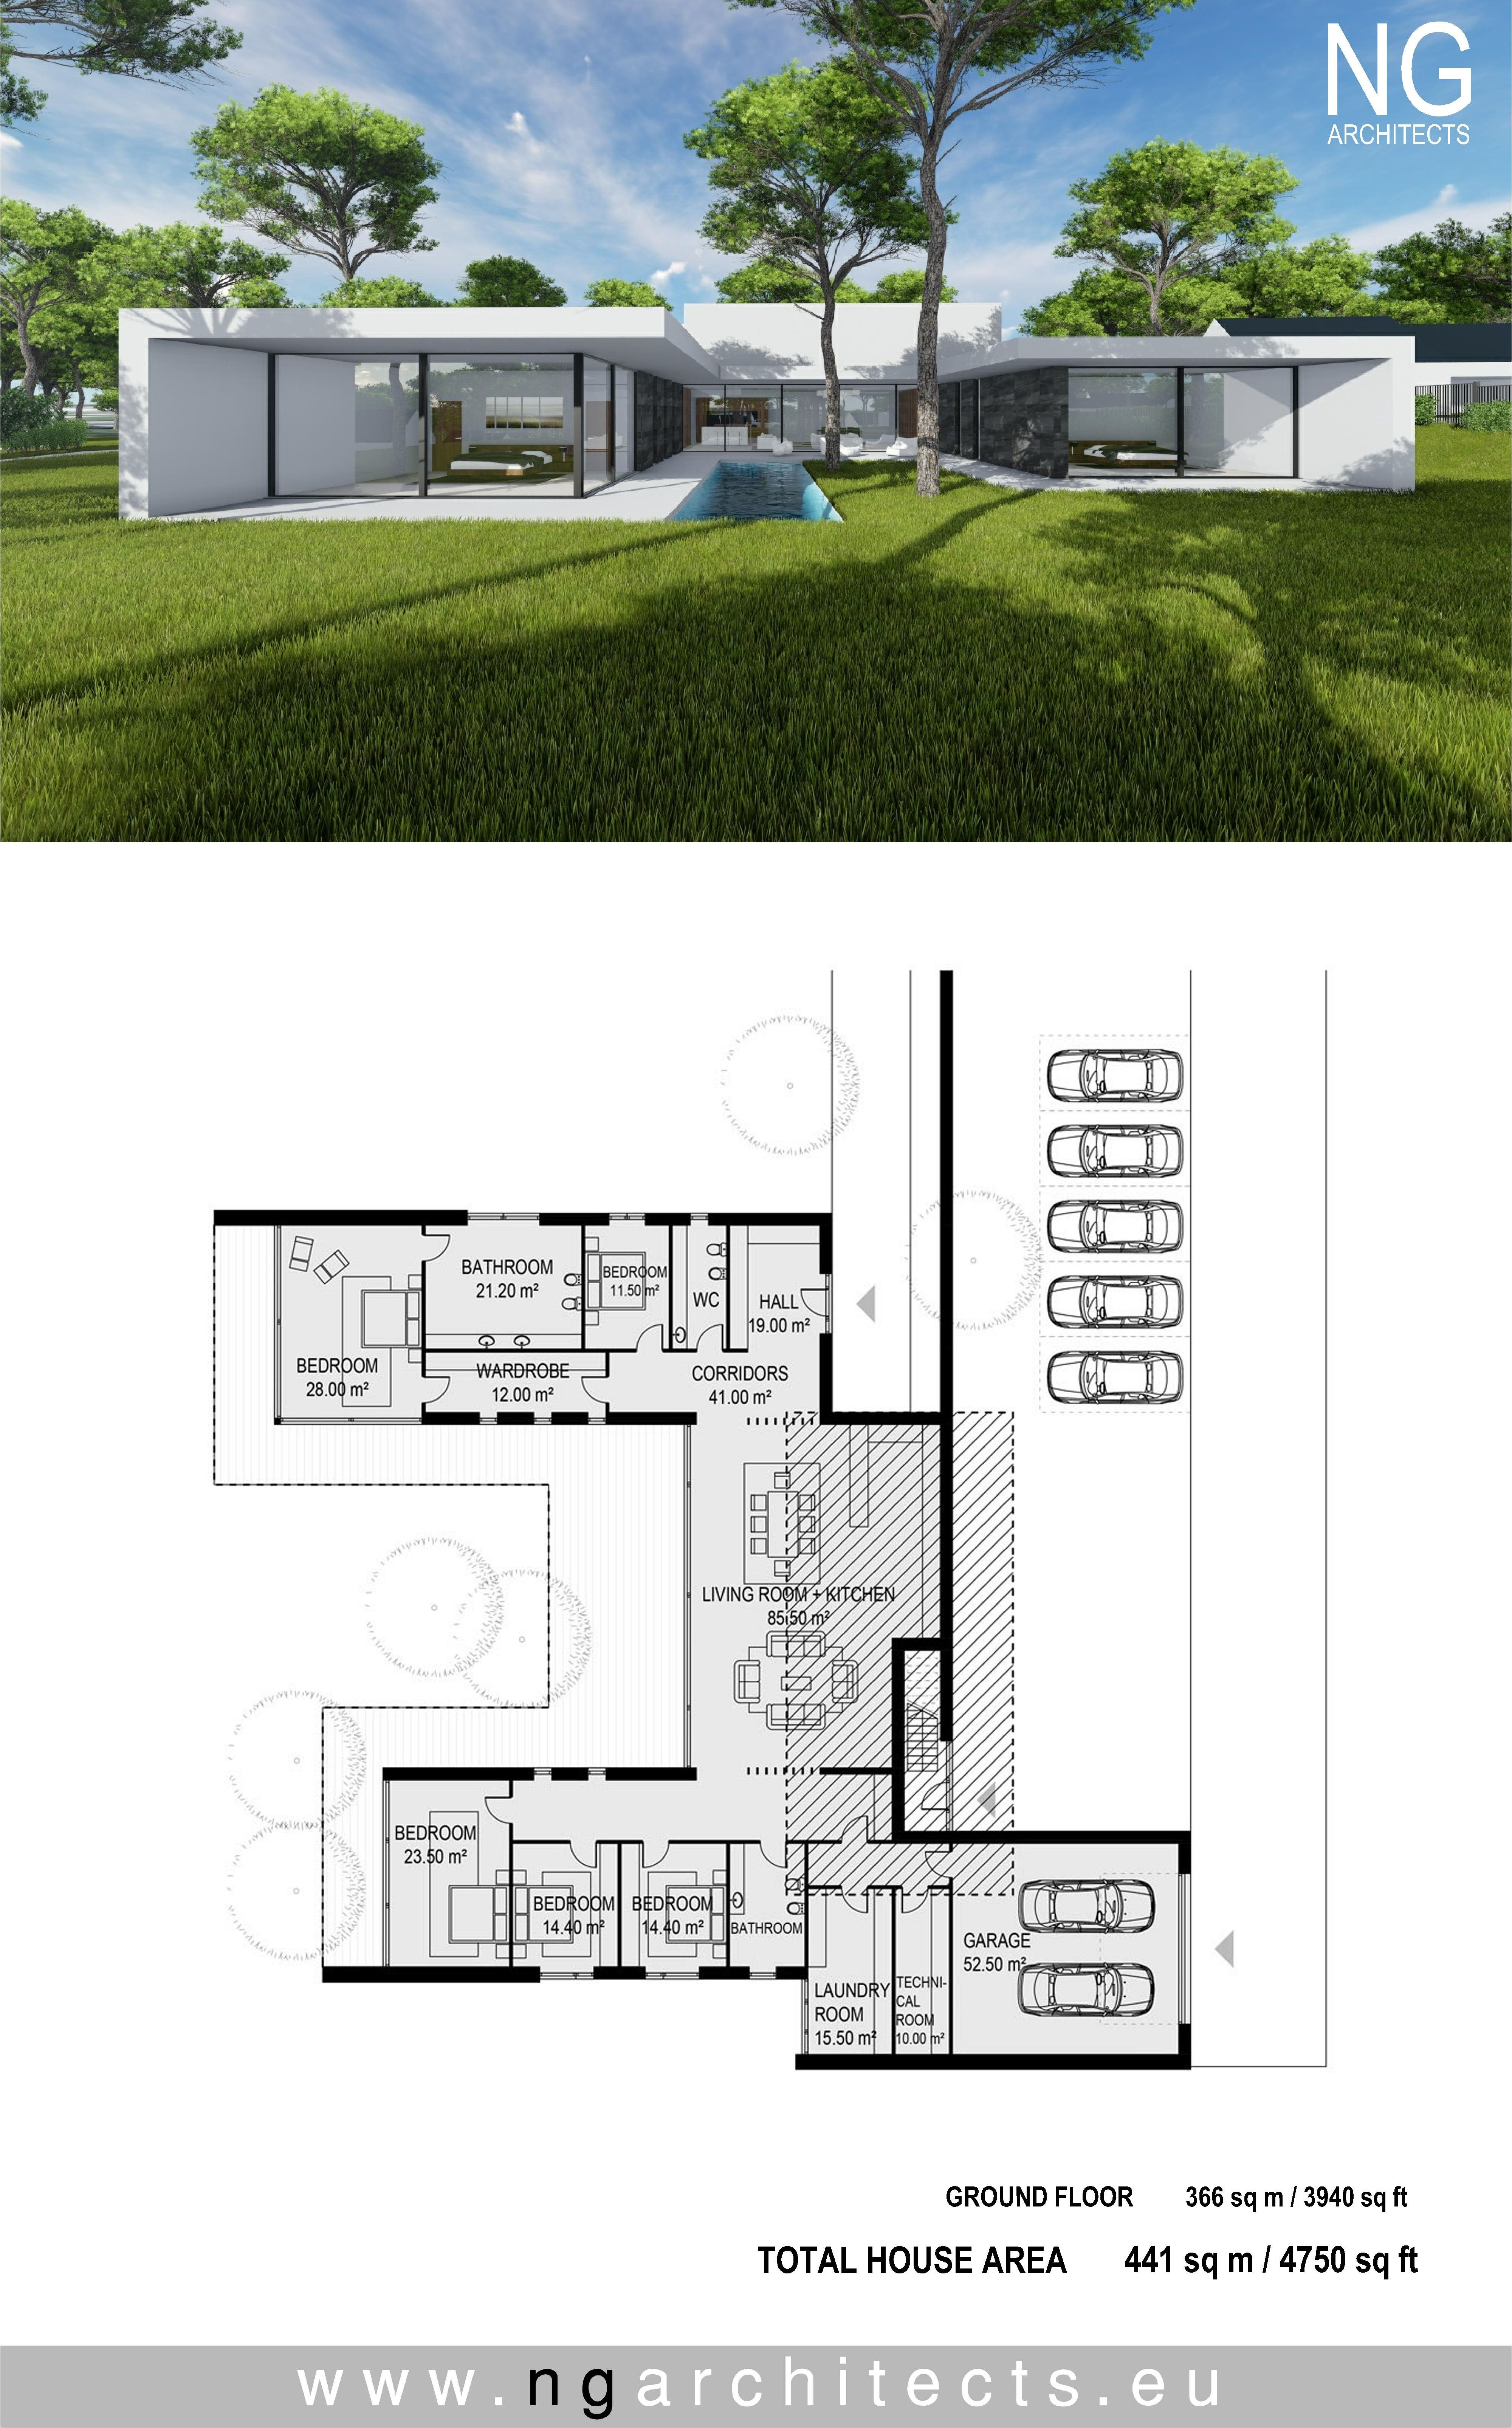 Modern House Plan Villa Unity Designed By NG Architects Www.ngarchitects.eu